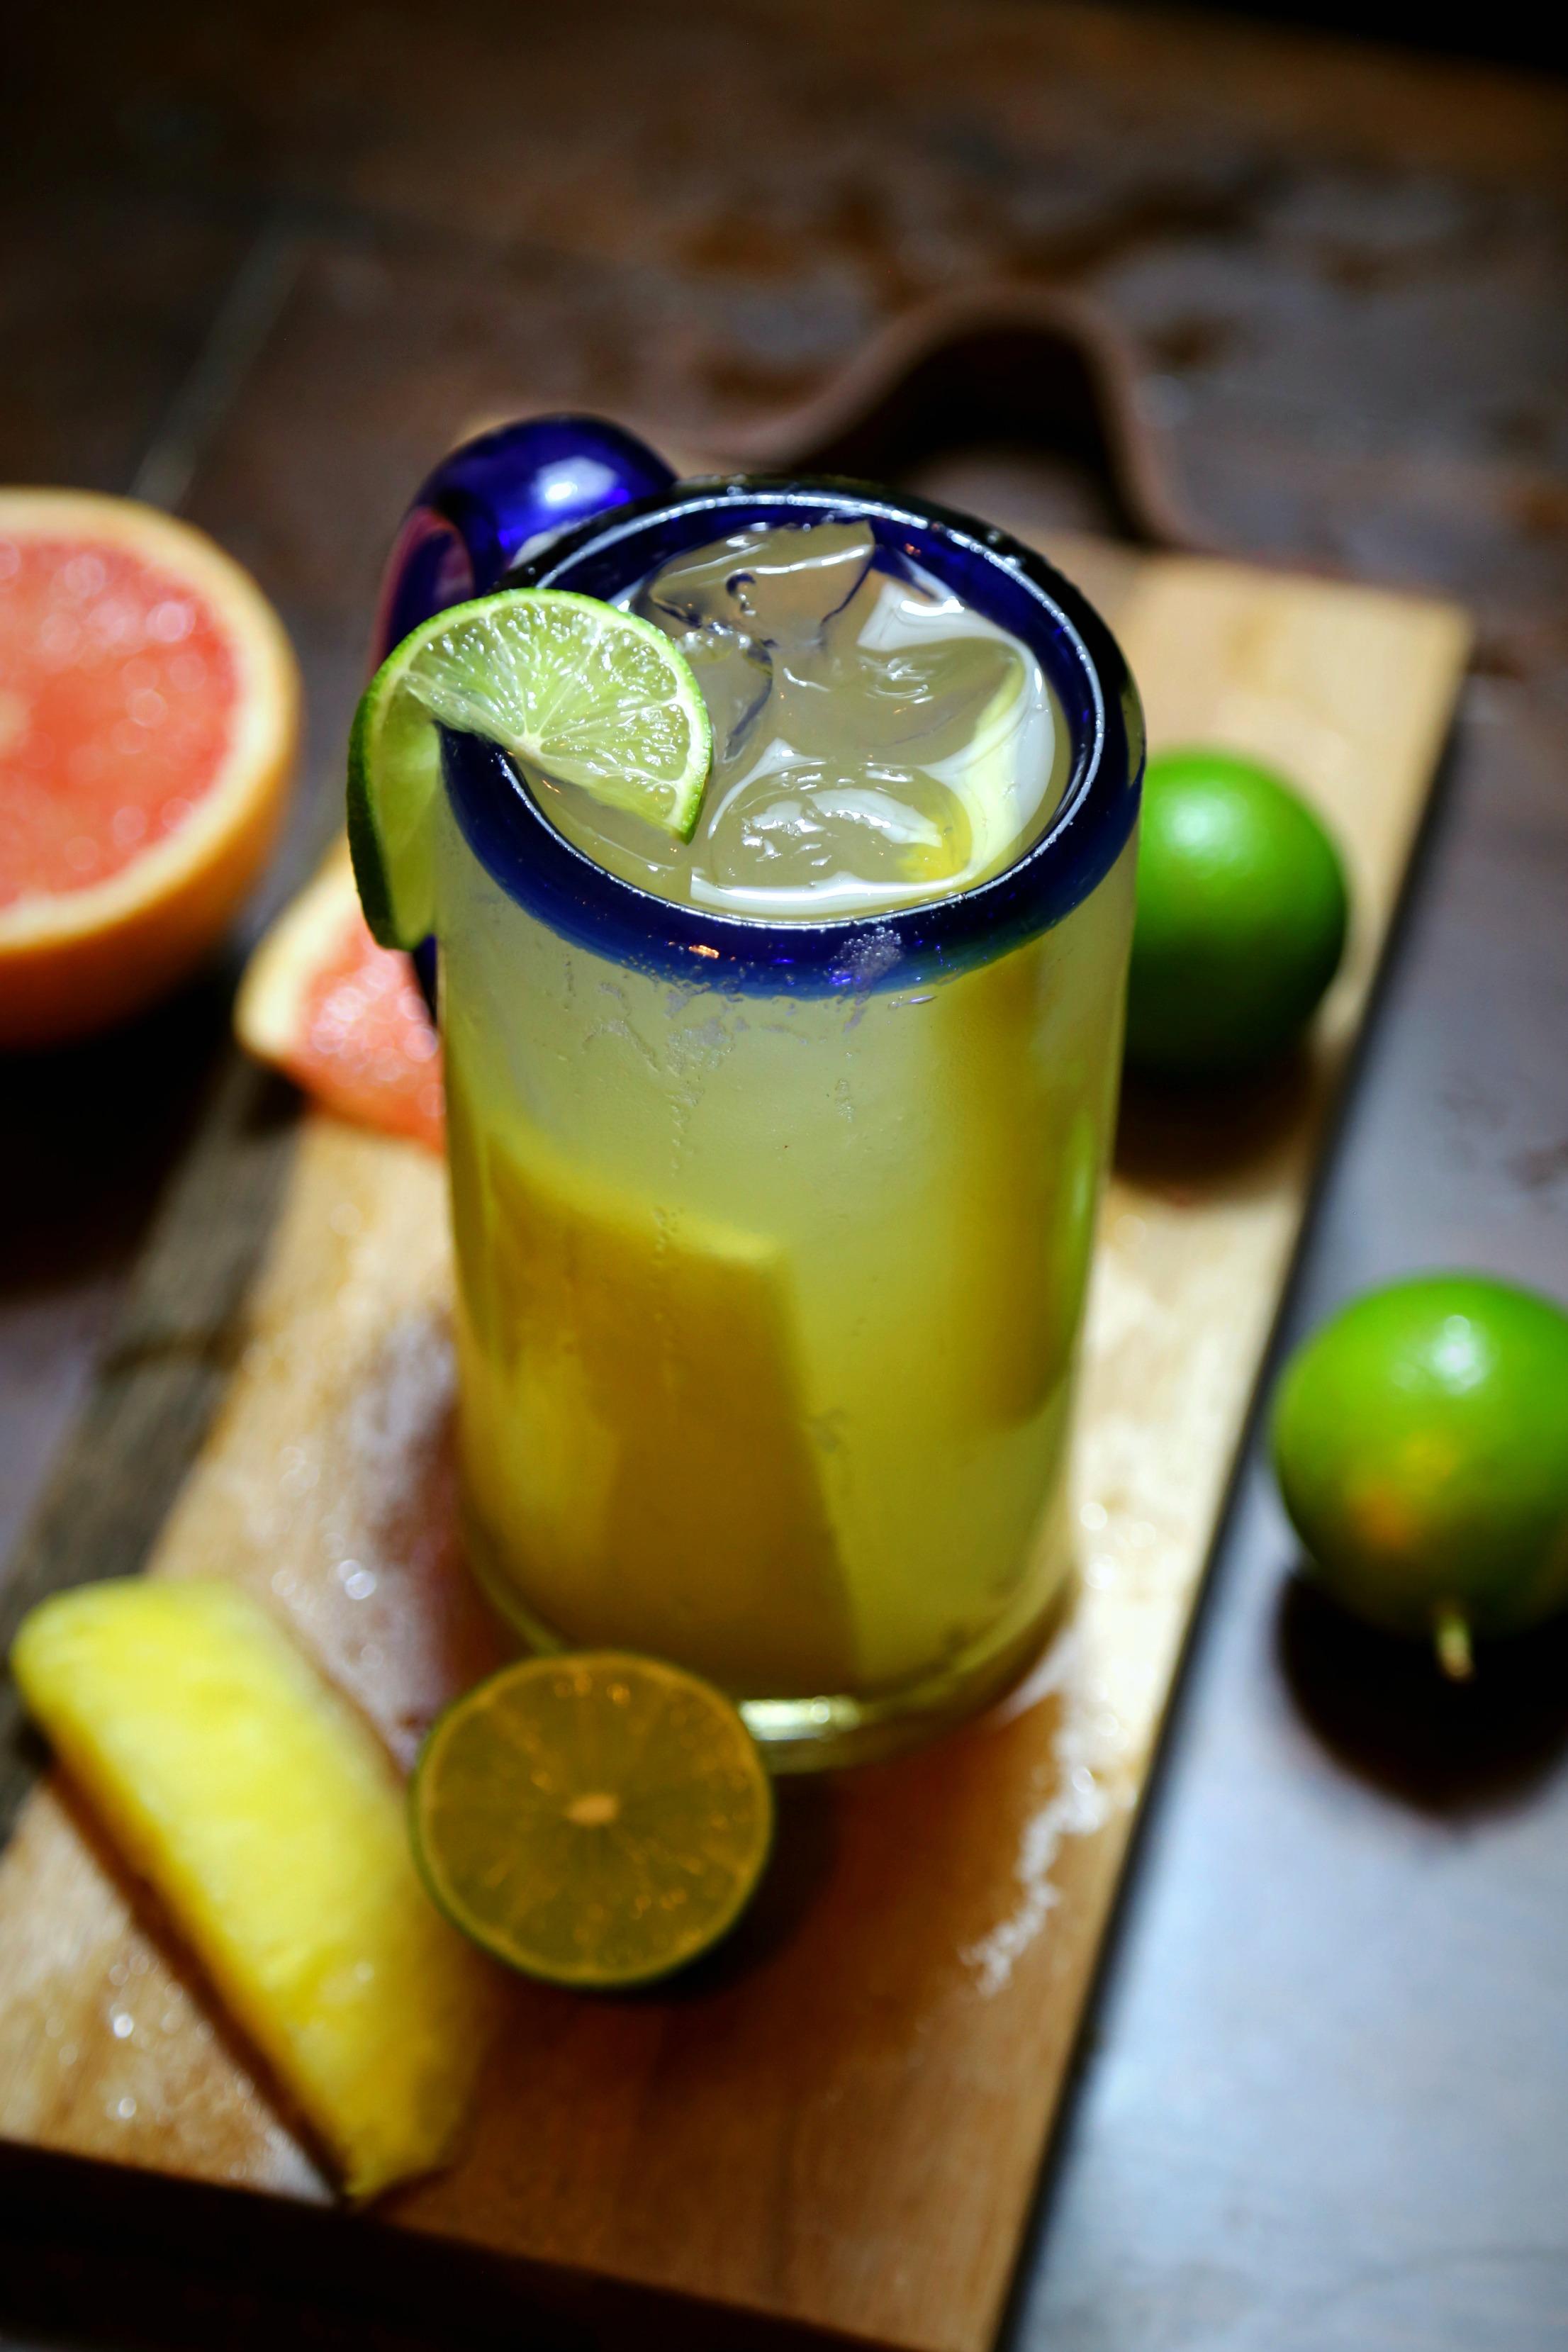 A Bubbly Life: Mango Jalapeño Margarita Cocktail Recipe